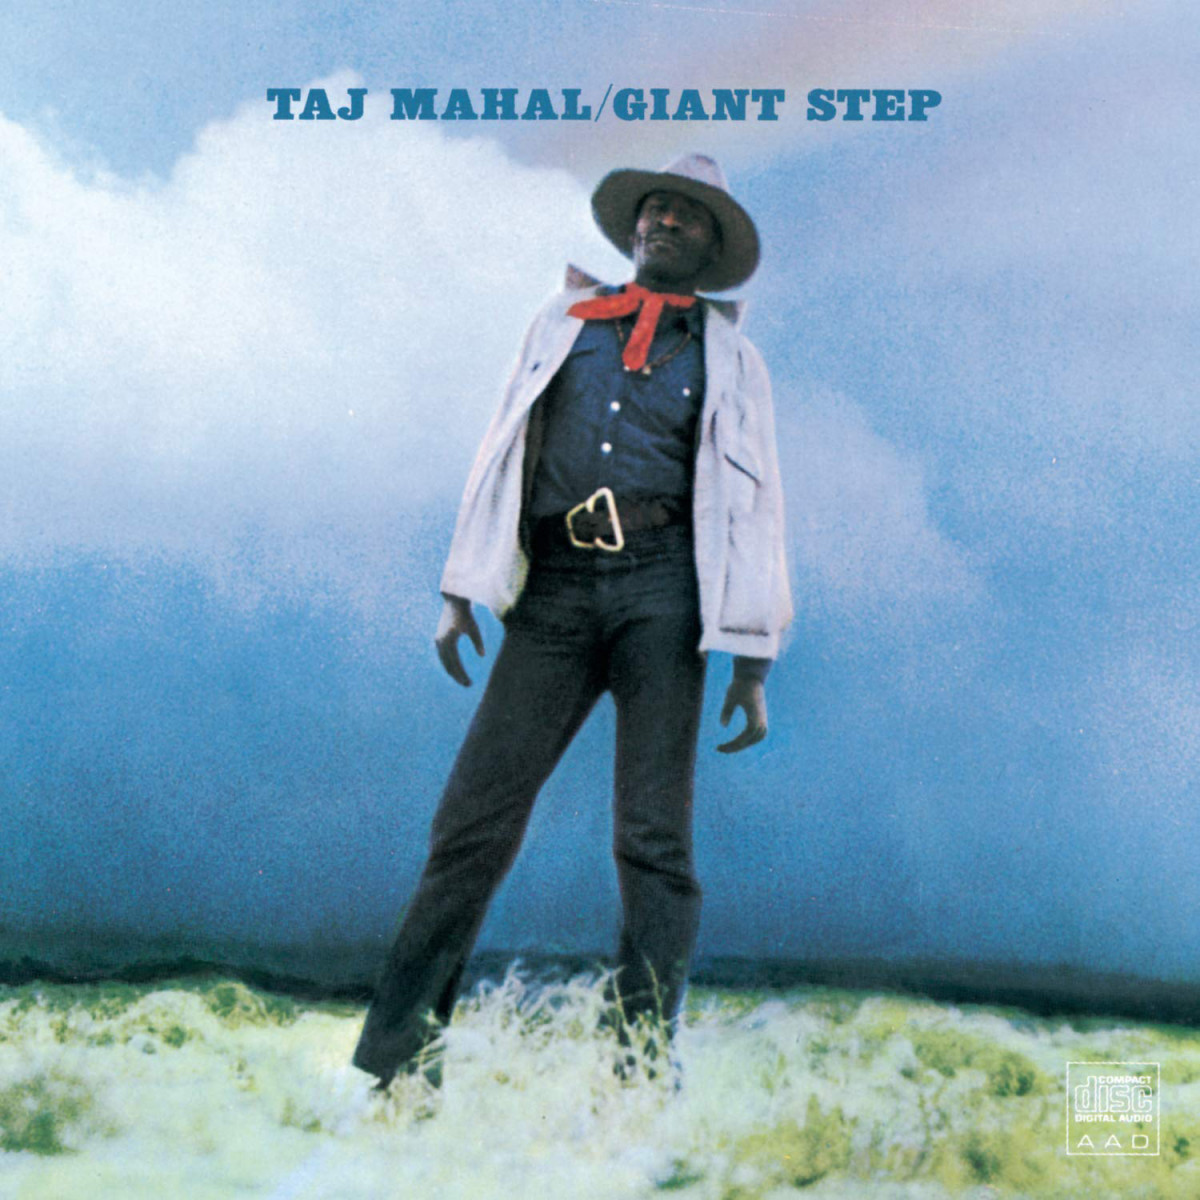 Taj Mahal, Giant Step